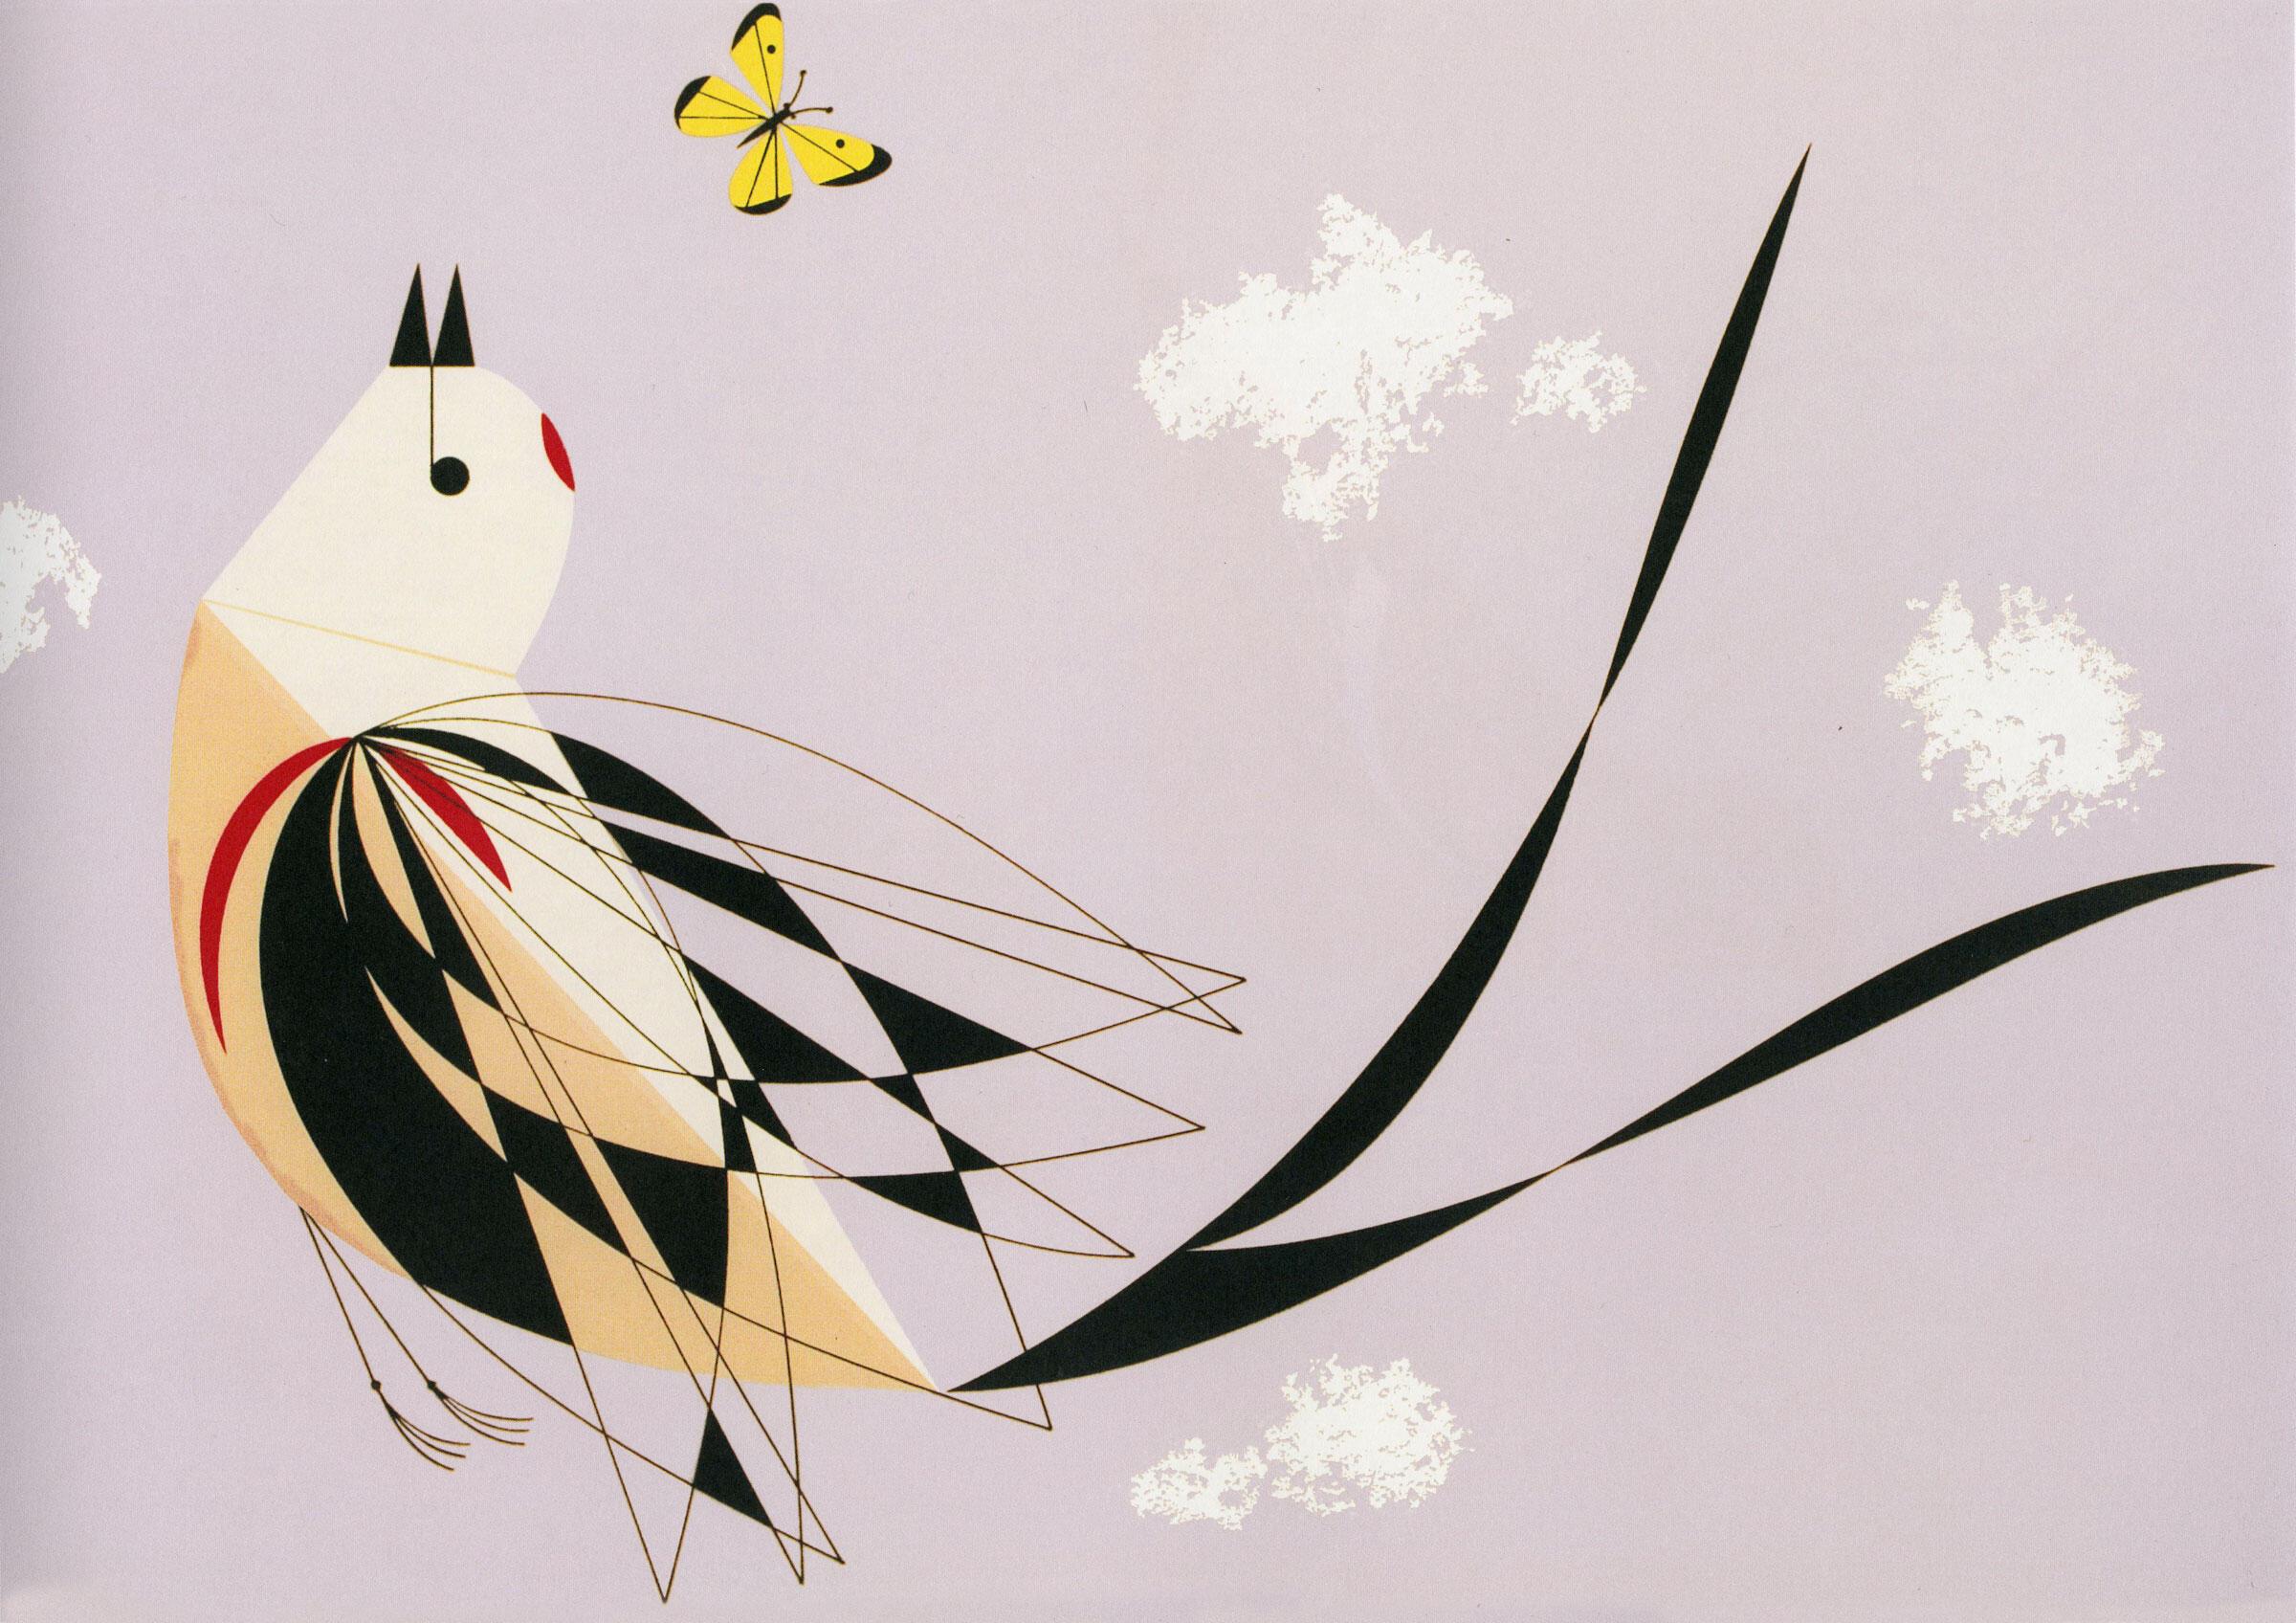 Scissor-tailed Flycatcher. lllustration: Charley Harper/AMMO